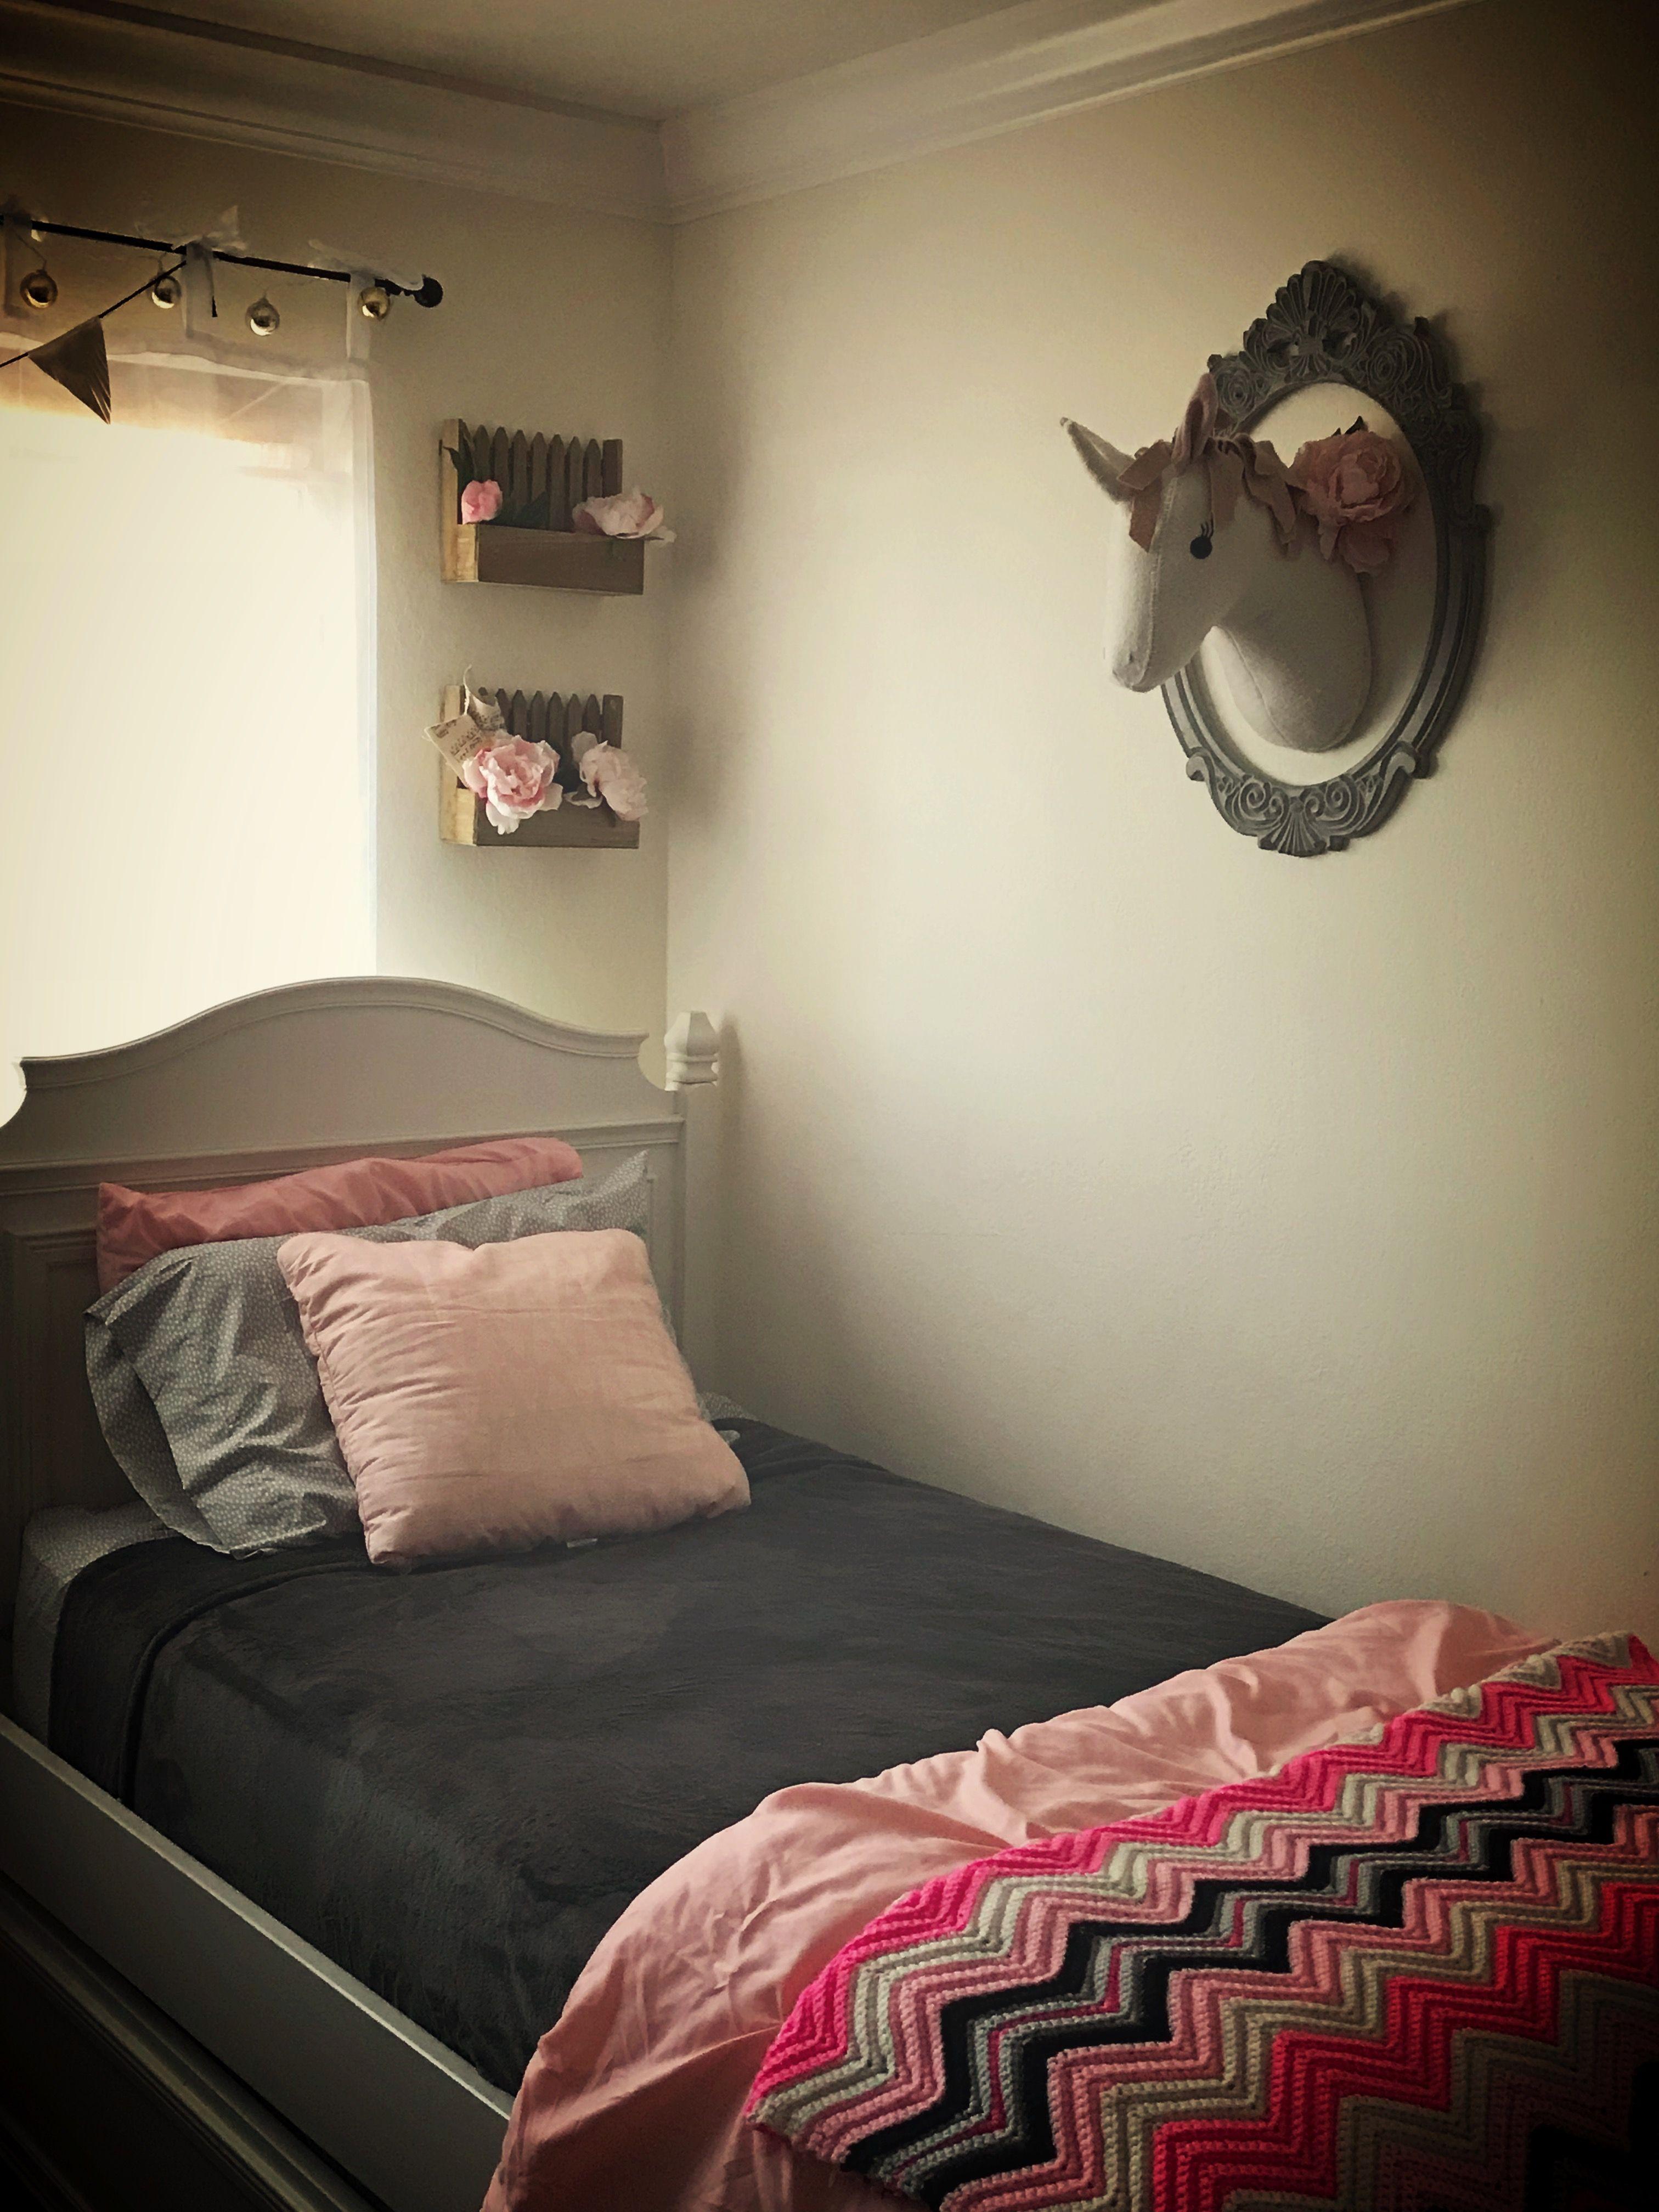 Toddler room | Fixer upper, Fixer upper style